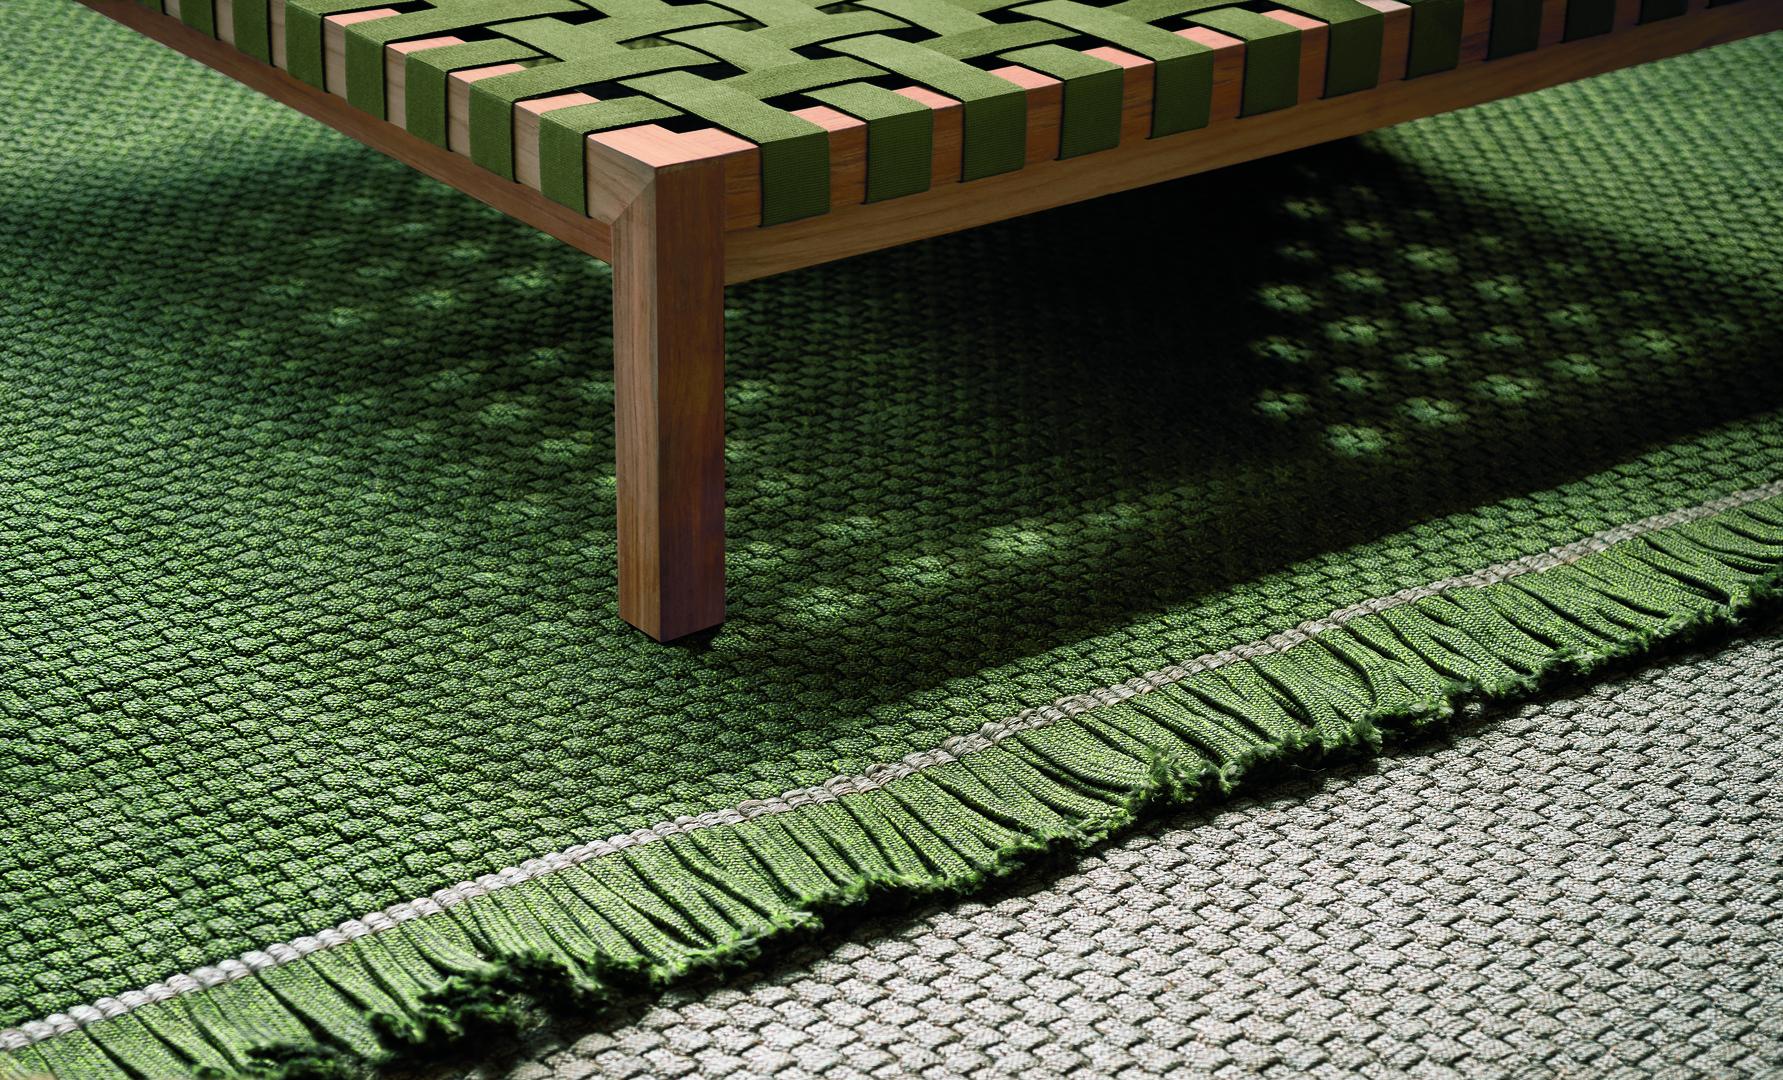 KNOT_rugs moss_clay 1_RODA.jpg